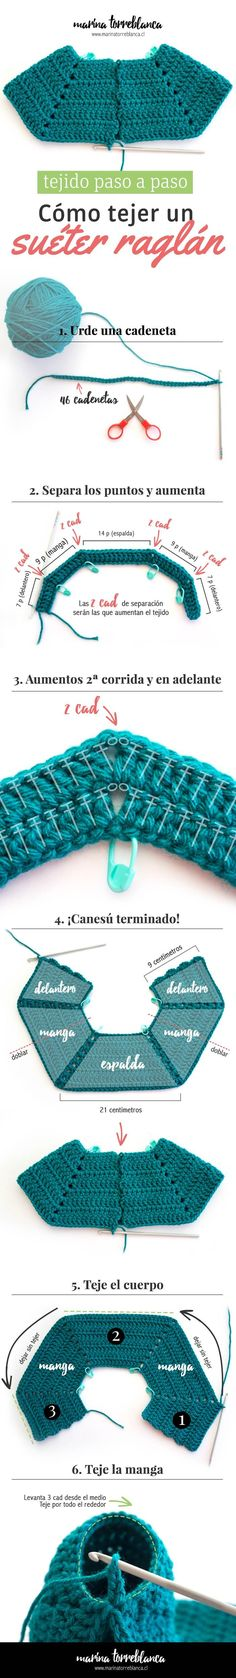 54 Ideas Crochet Baby Sweater Measurements Free Pattern For 2019 Pull Crochet, Crochet Girls, Crochet Baby Clothes, Crochet For Kids, Knit Crochet, Baby Knitting Patterns, Crochet Patterns, Amigurumi Patterns, Cardigan Au Crochet